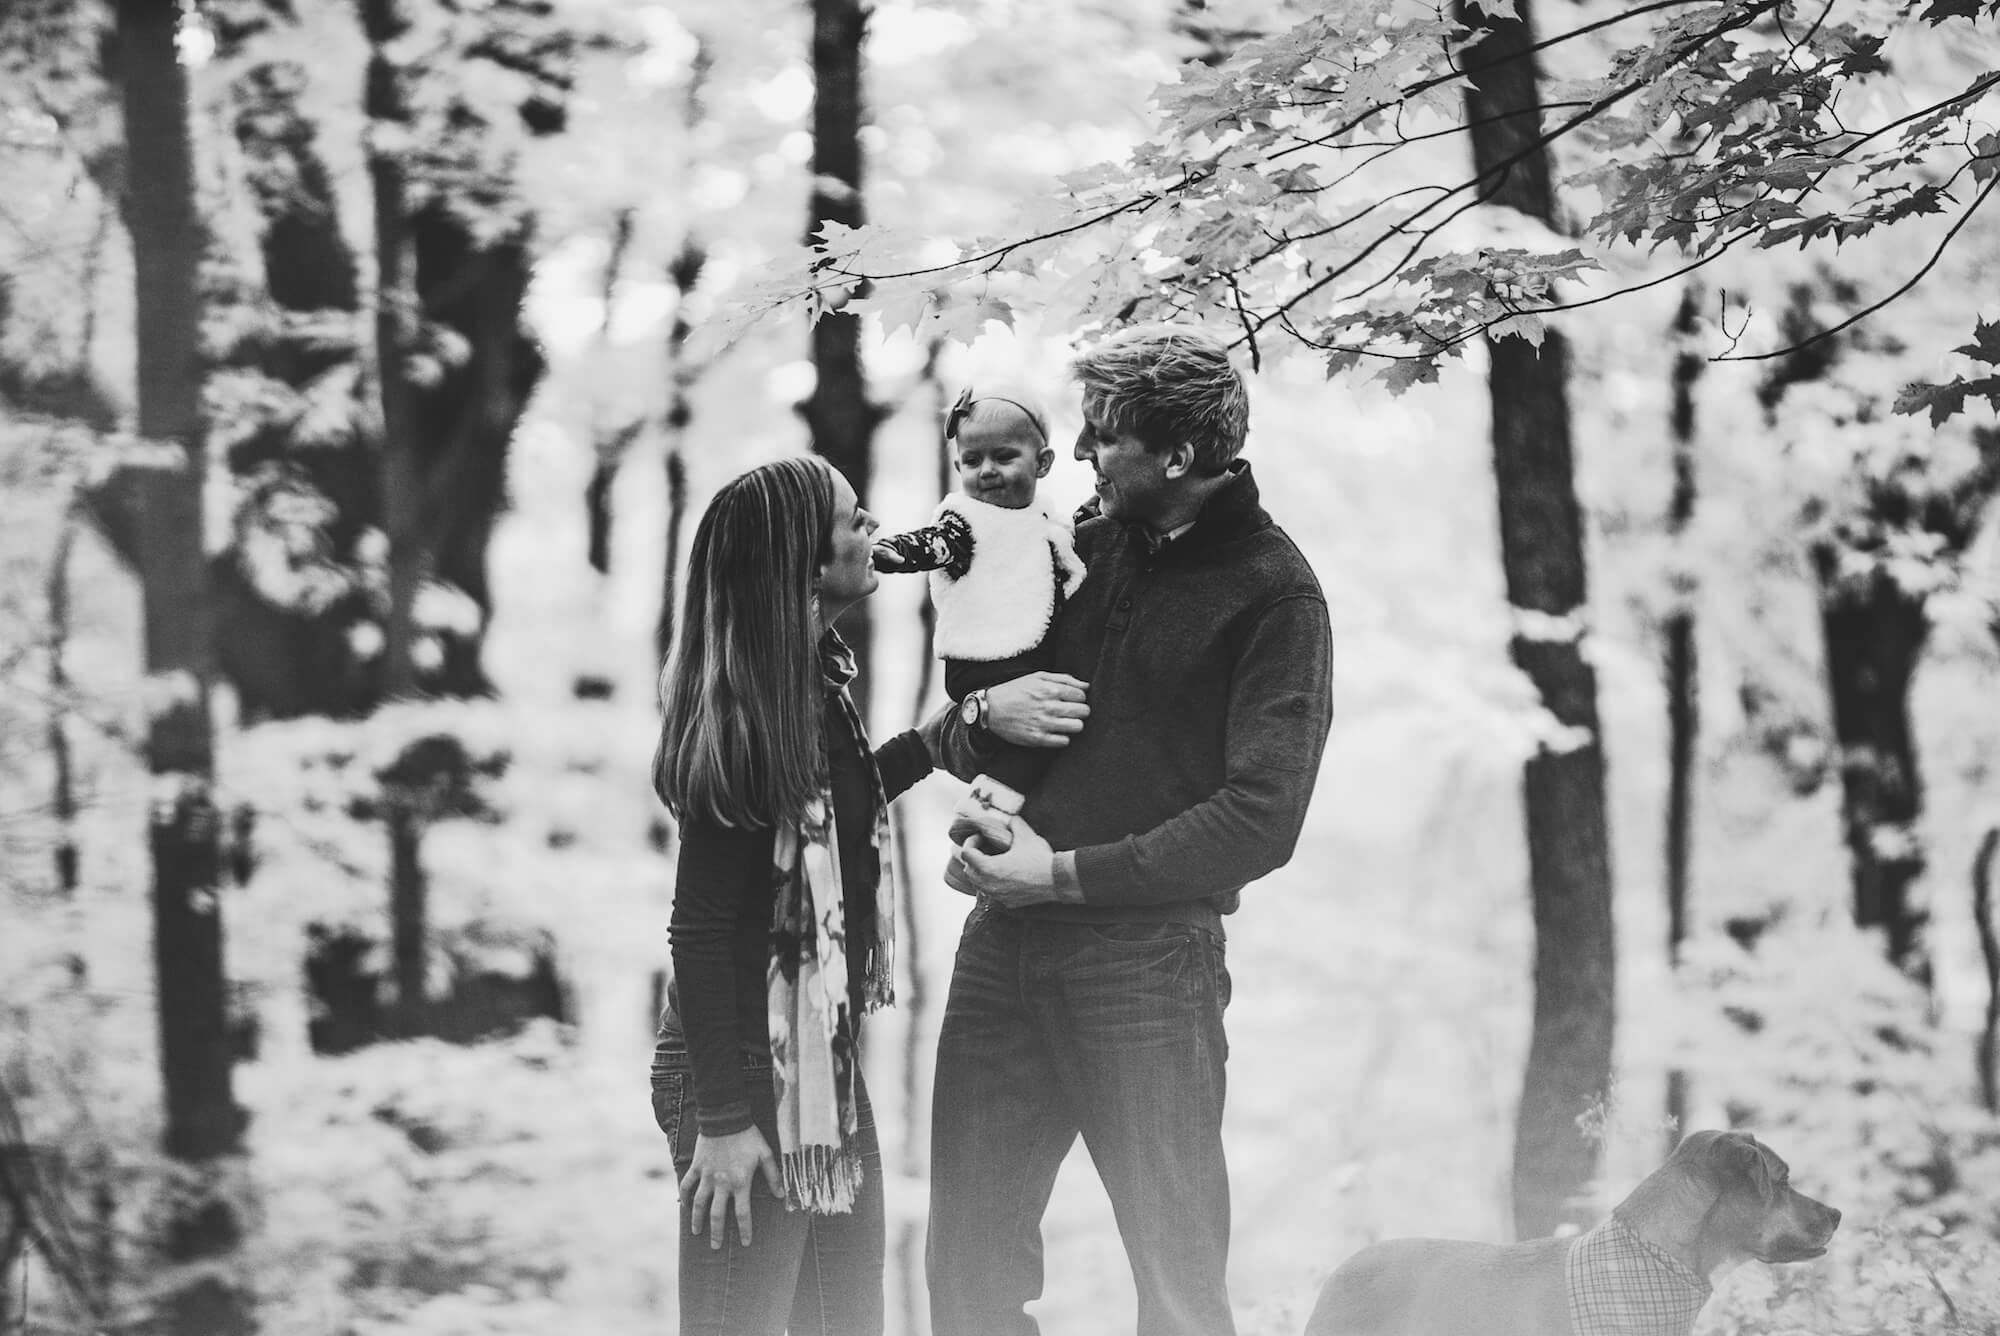 engle-olson-family-photography-session-11.jpg